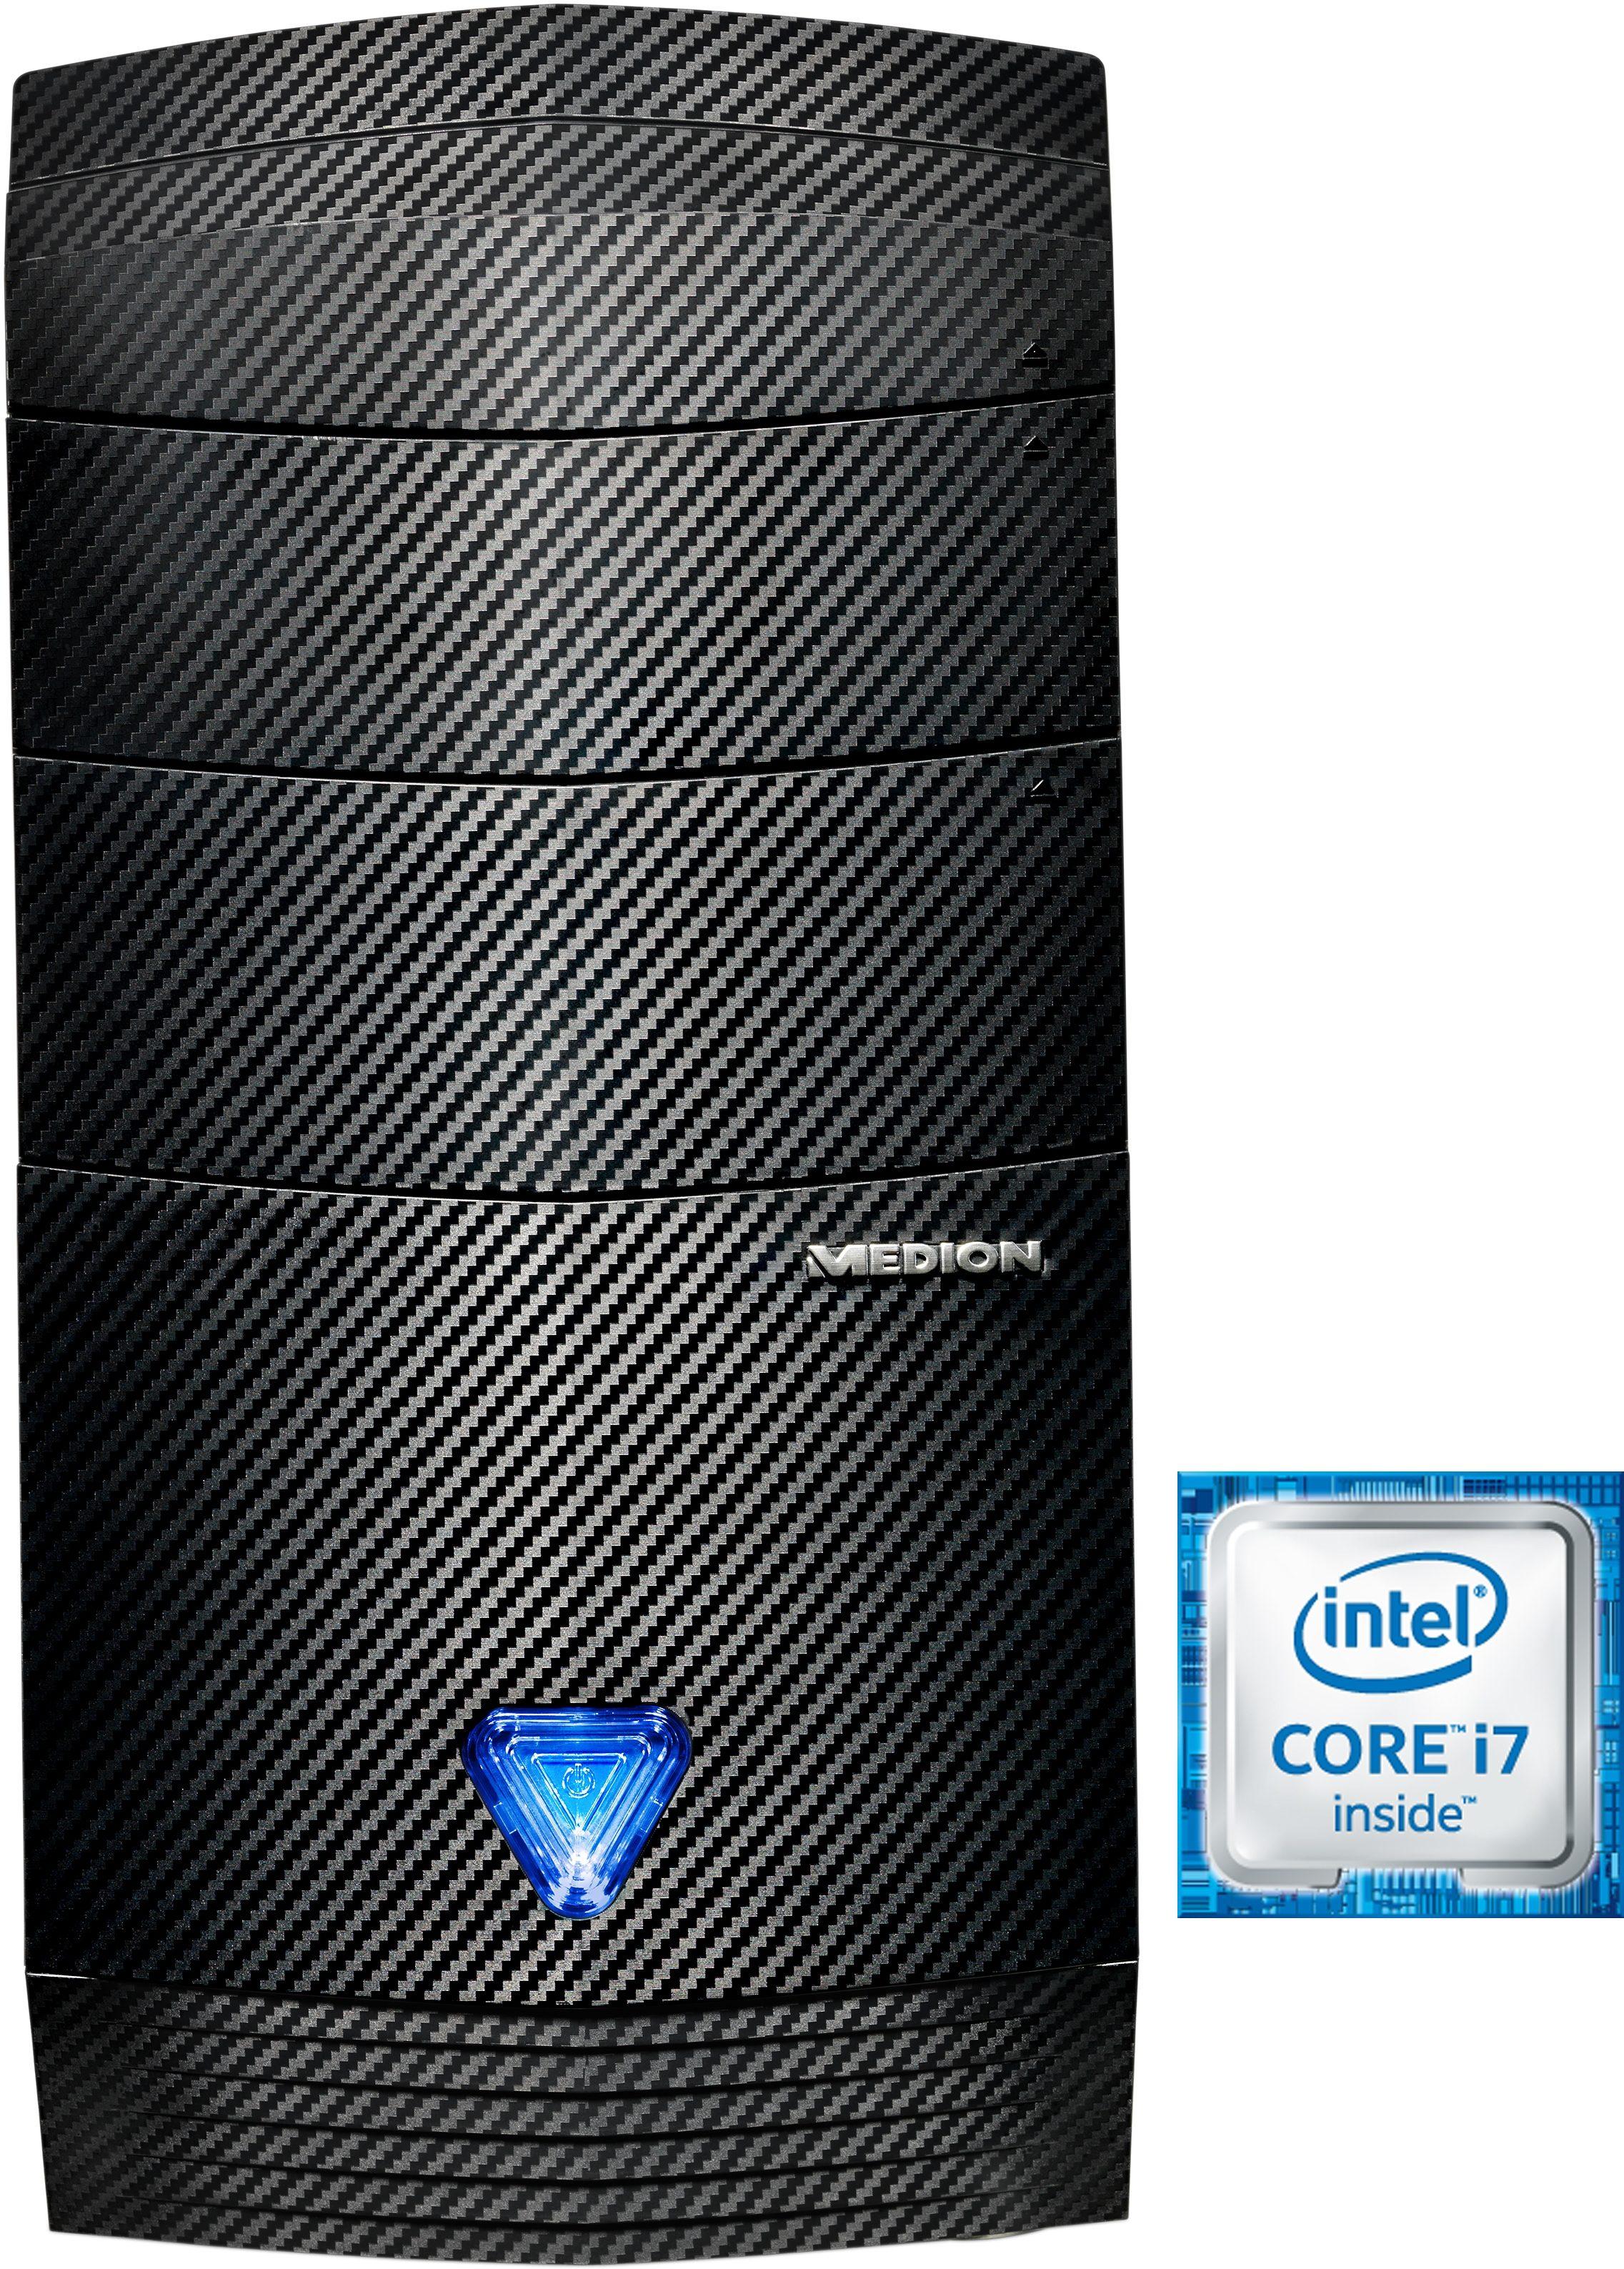 Medion® Akoya P5396 H (S91) PC, Intel® Core™ i7, 8192 MB DDR3-RAM, 1128 GB Speicher